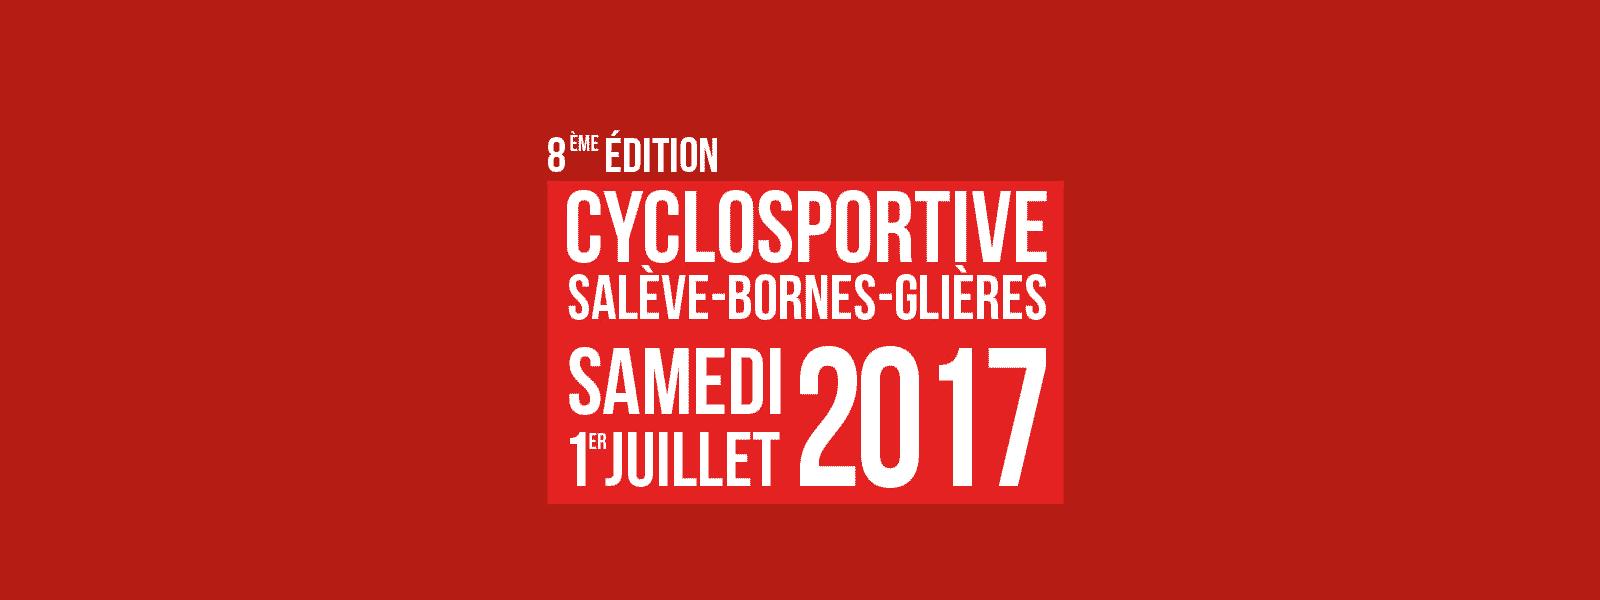 Cyclosportive Salève-Bornes-Glières 2017